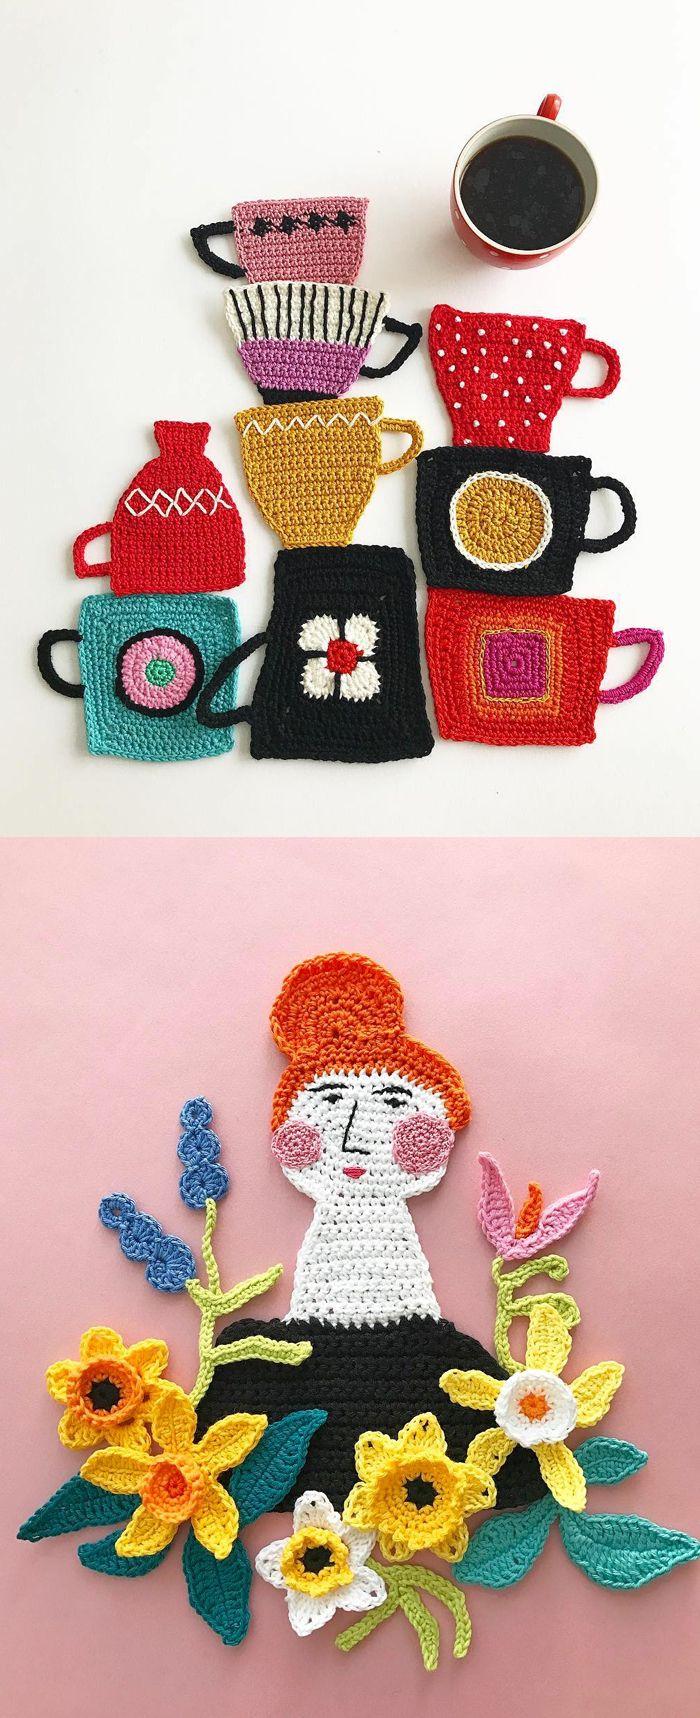 Crochet art by Tuija Heikkinen // crochet // fiber art // embroidery ...